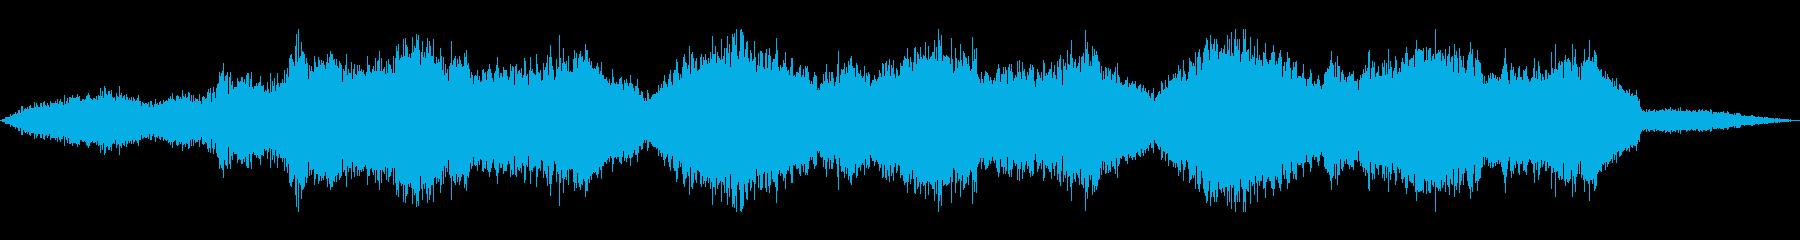 METALLIC BELL MON...の再生済みの波形